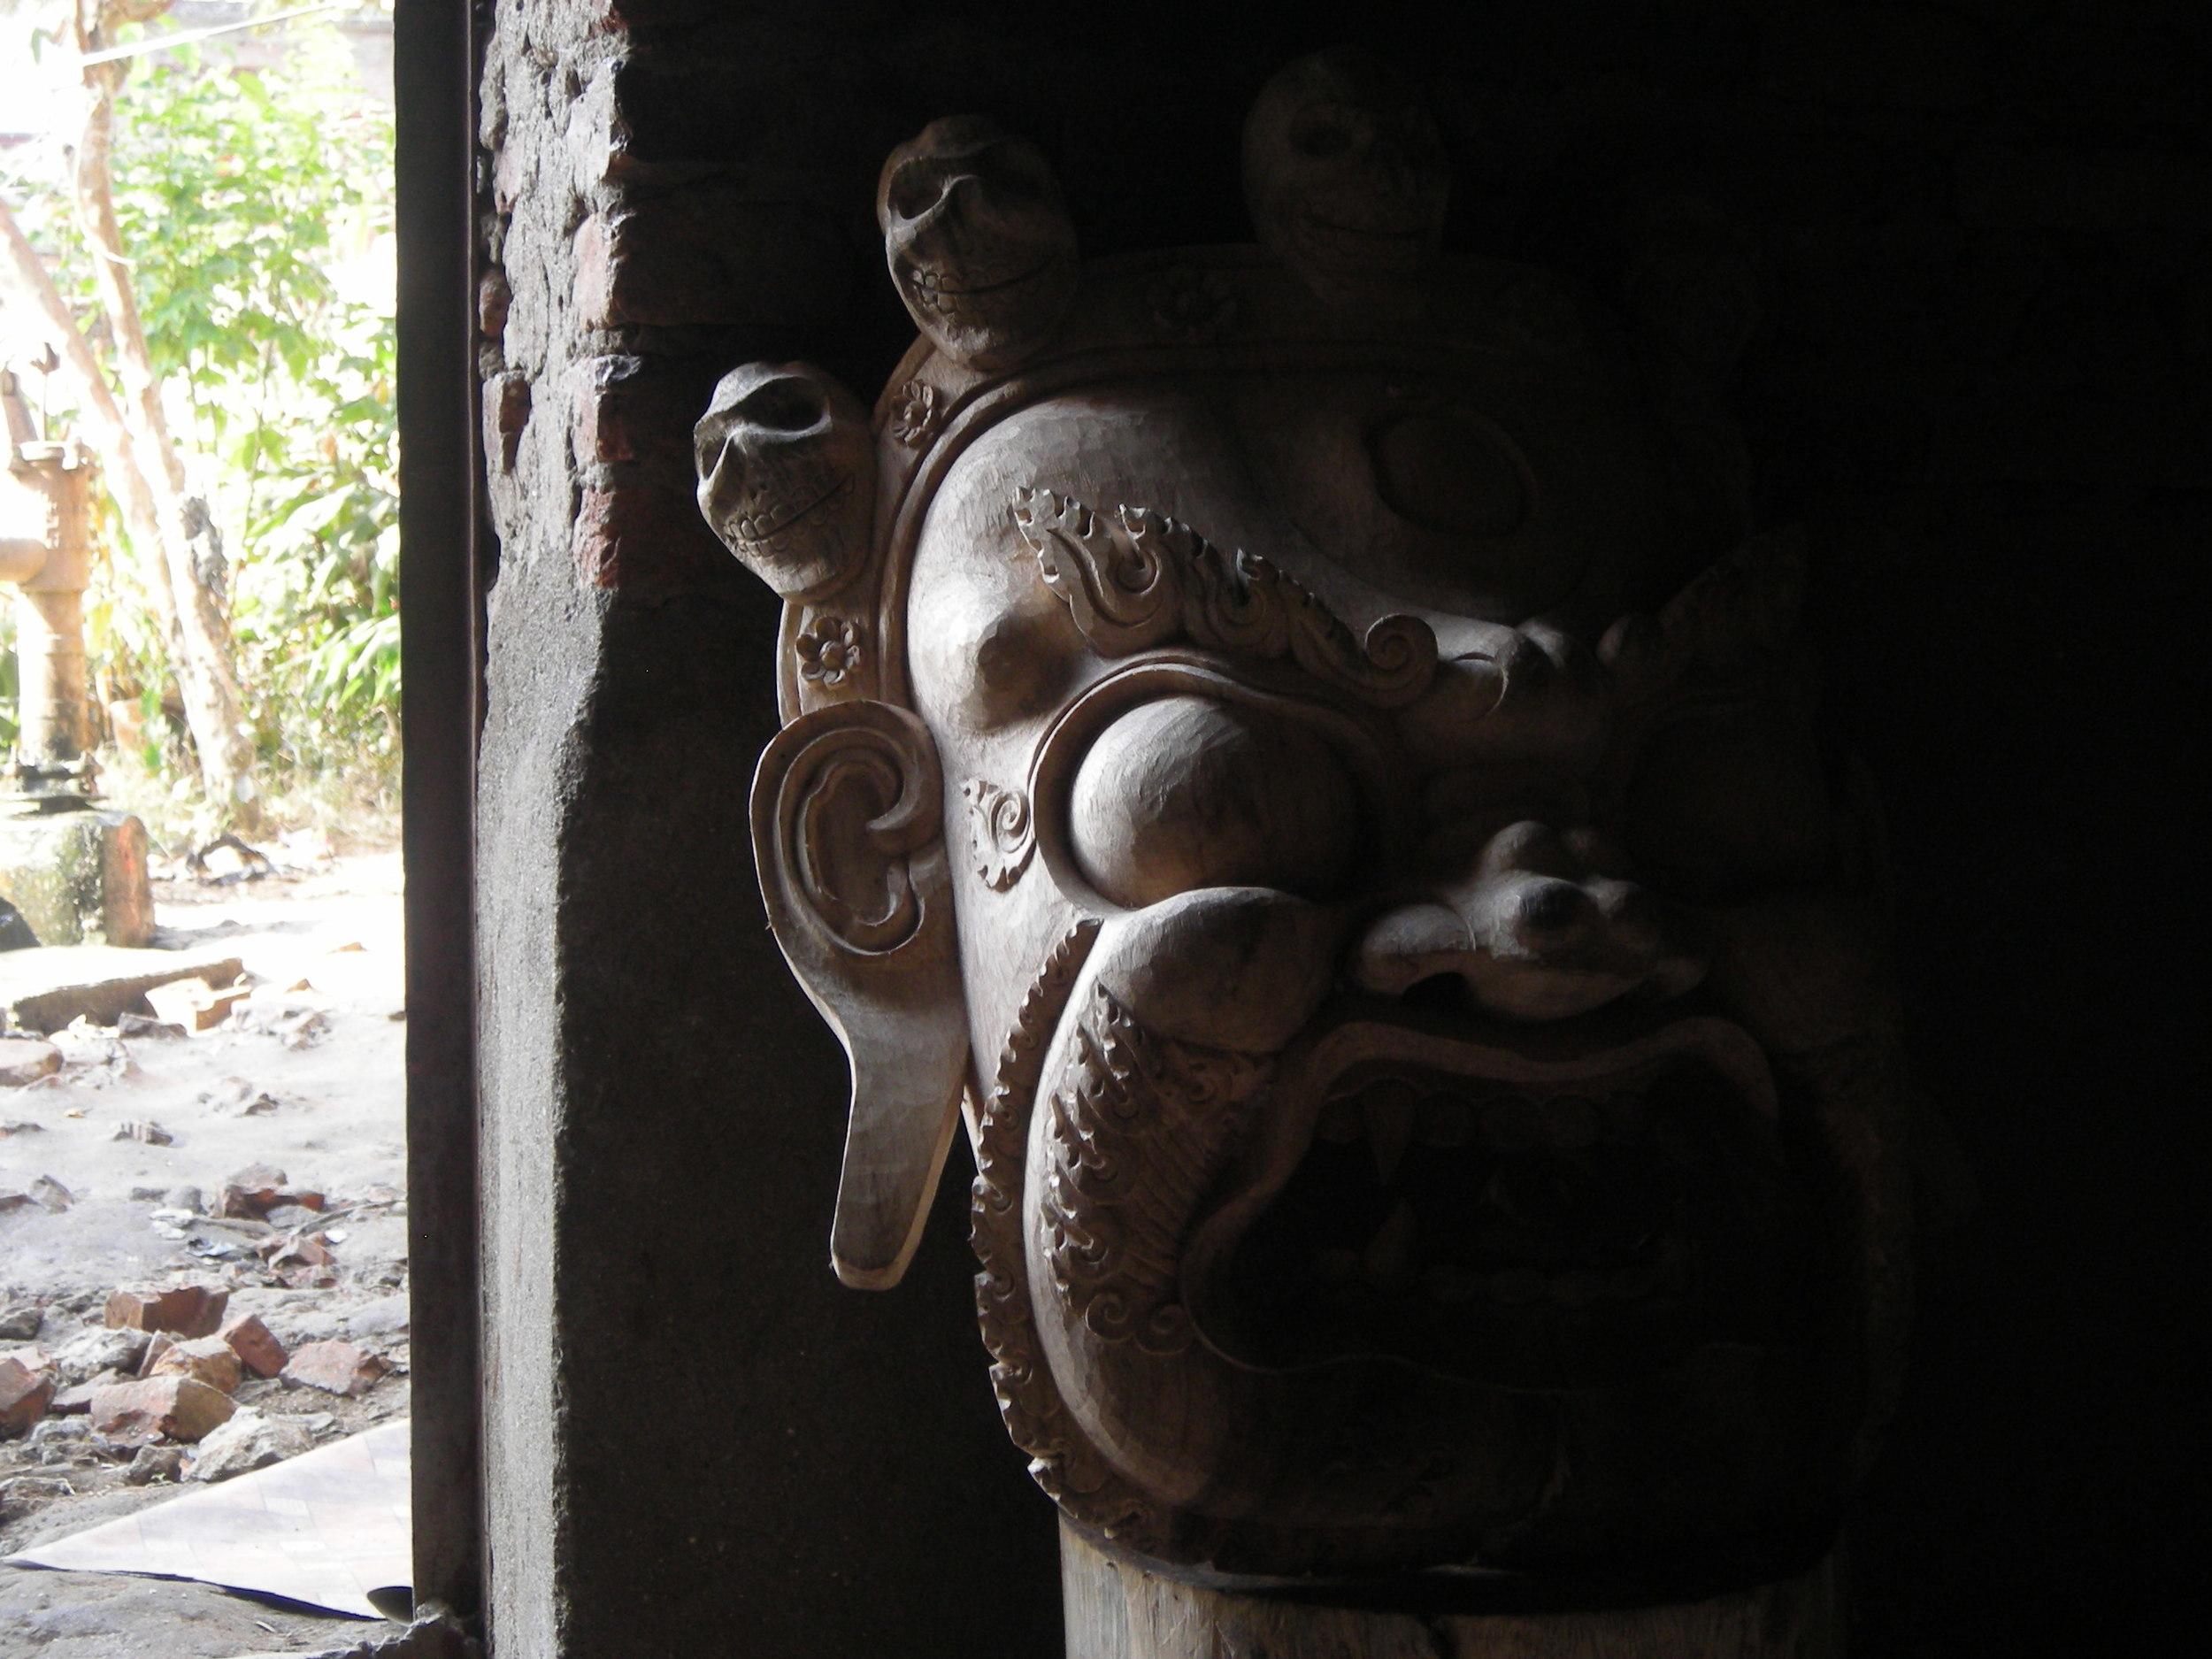 The Bhairav Gopi-lal-ji was working on